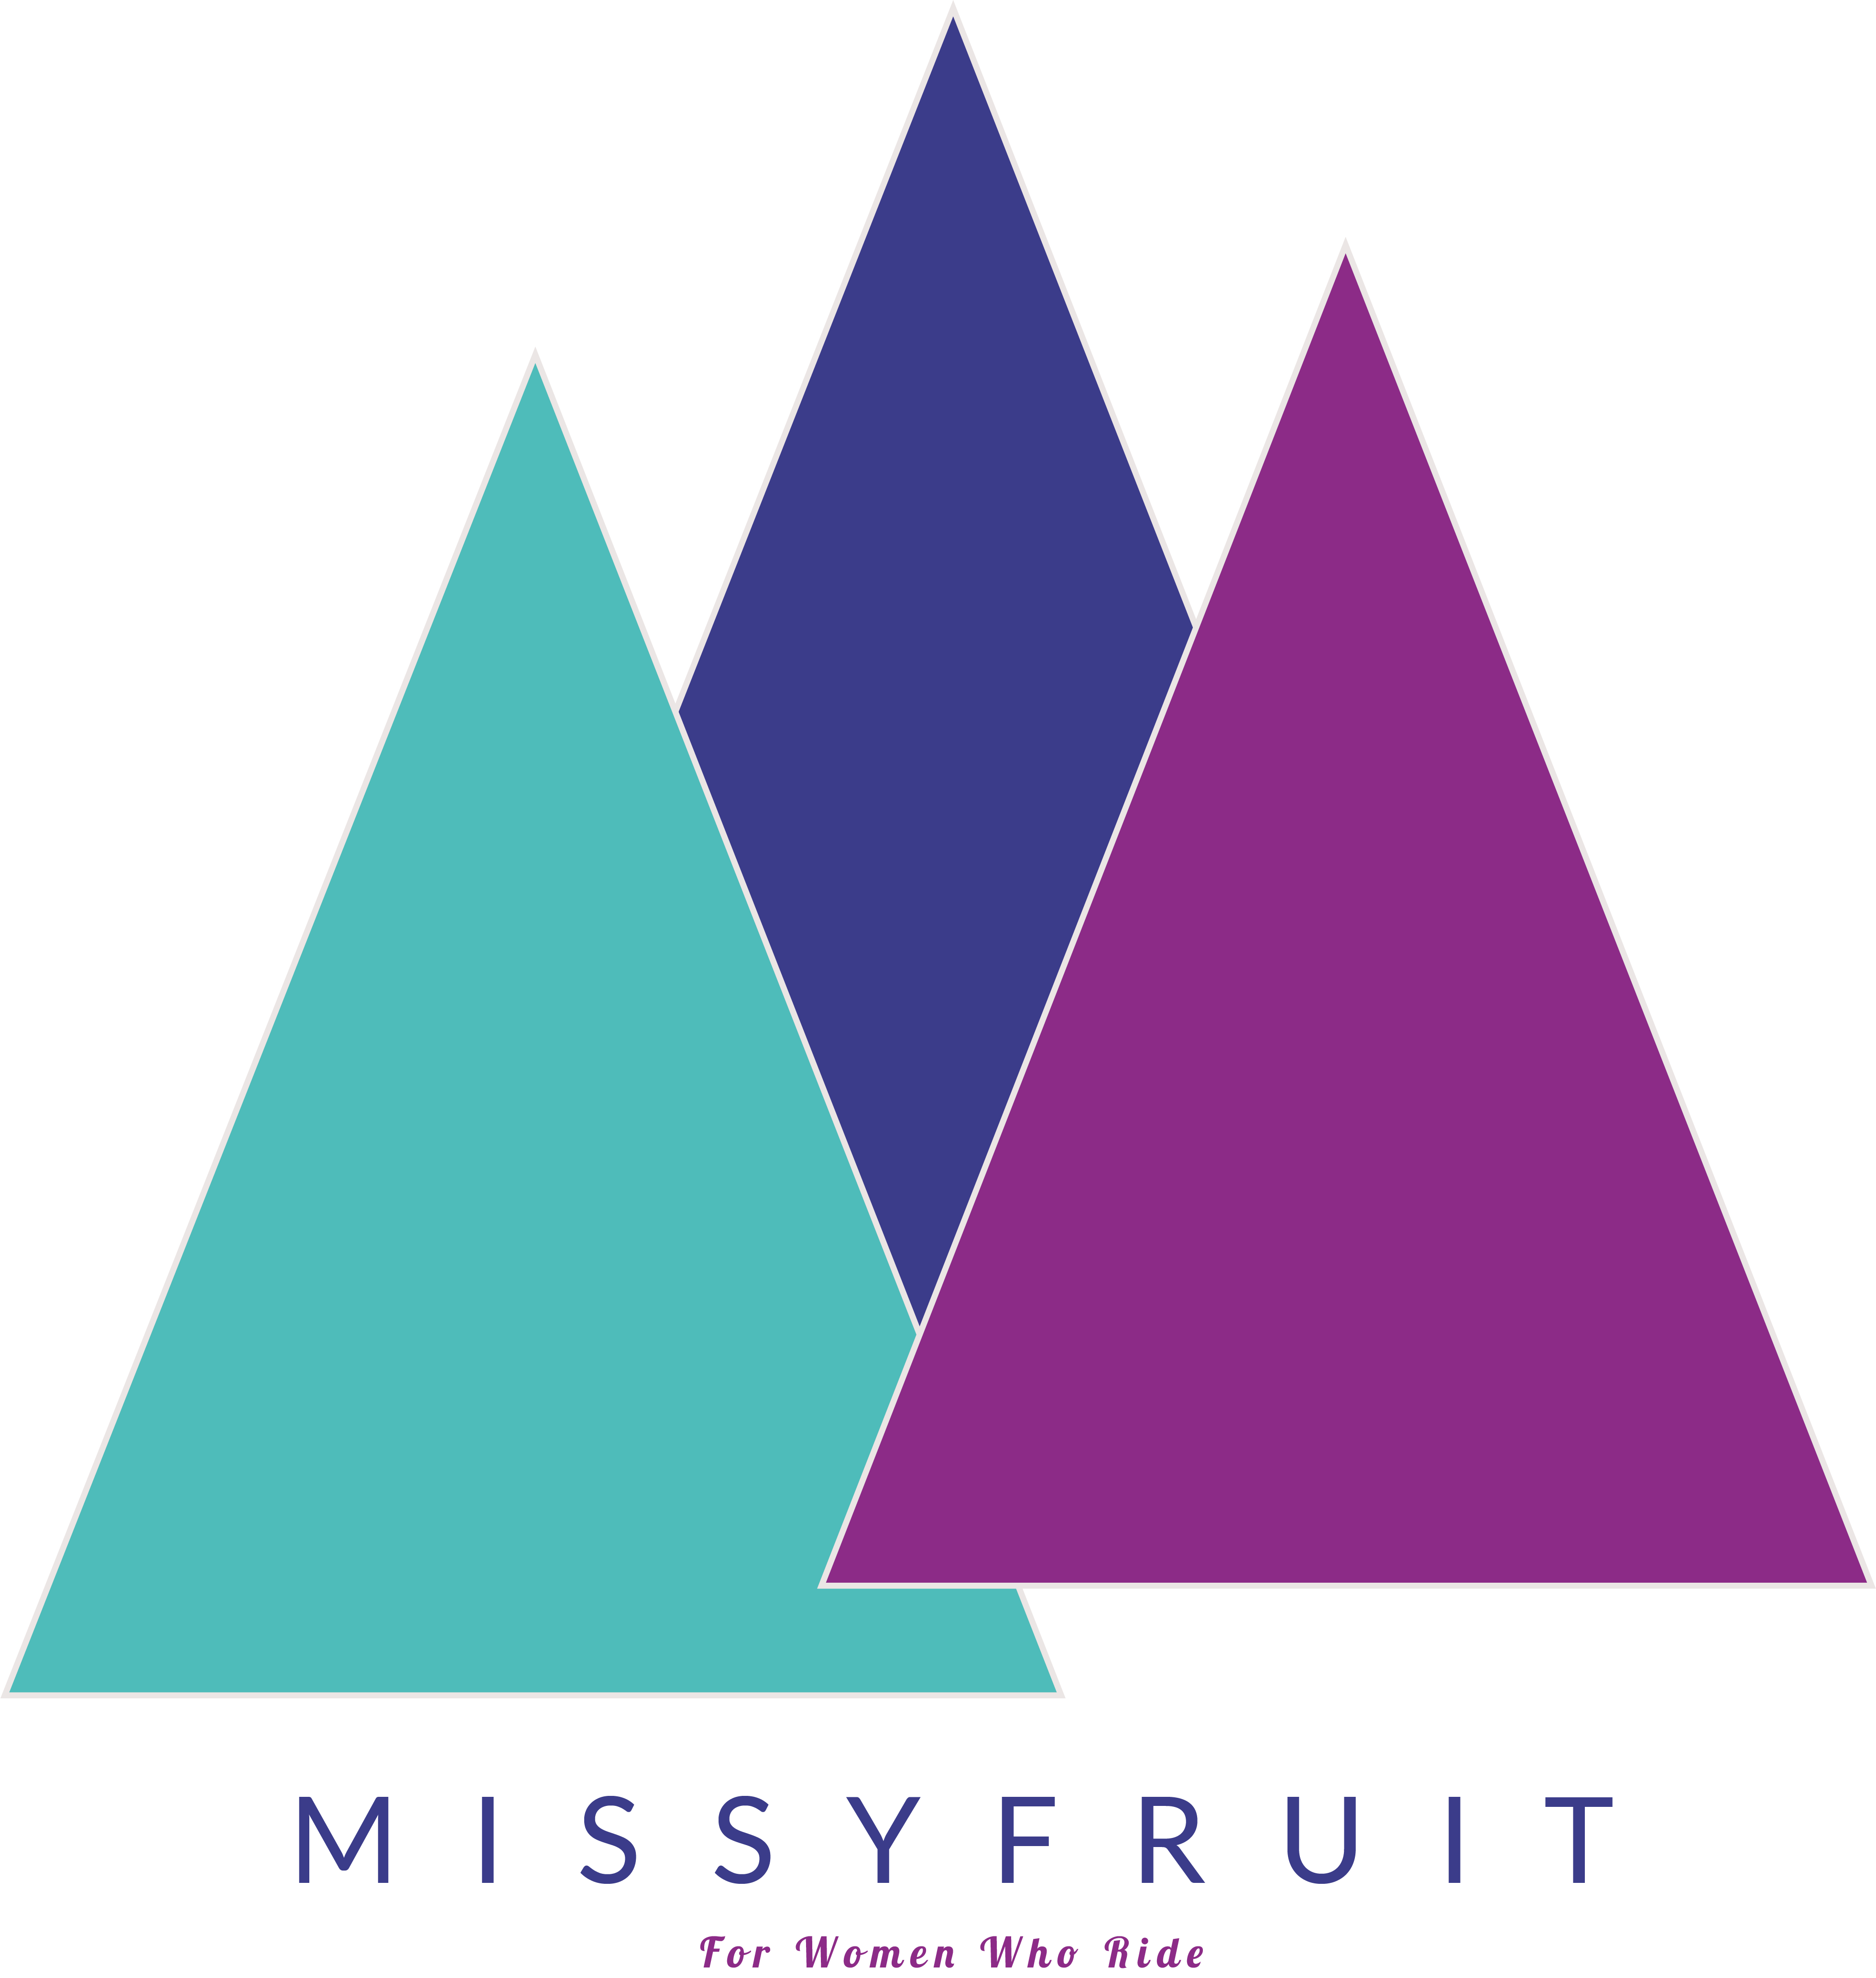 Missyfruit-surf-féminin-surfgirl